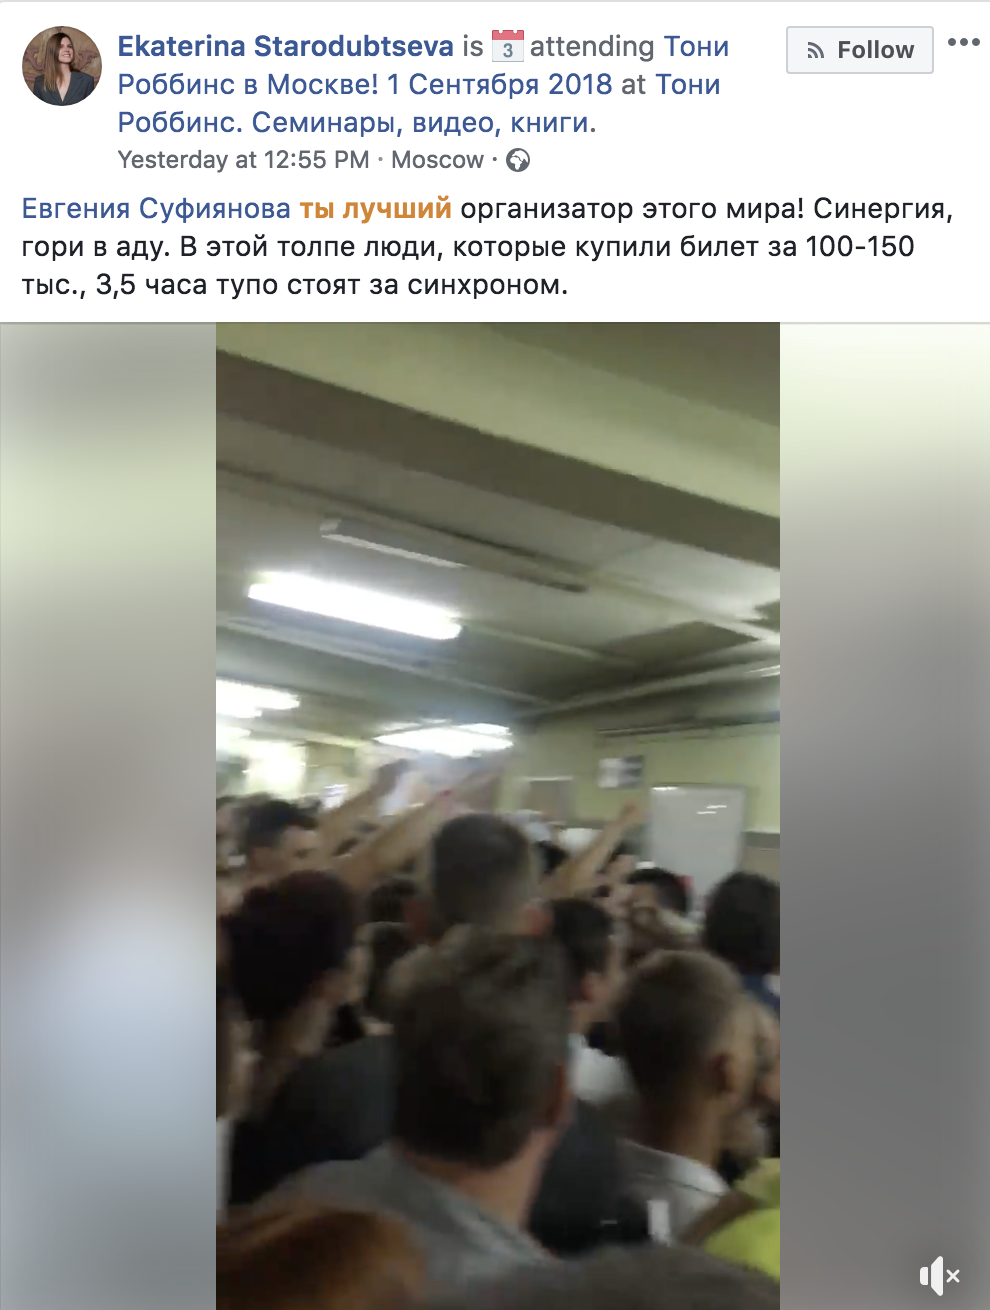 Скриншот © L!FE/facebook.com/Екатерина Стародубцева